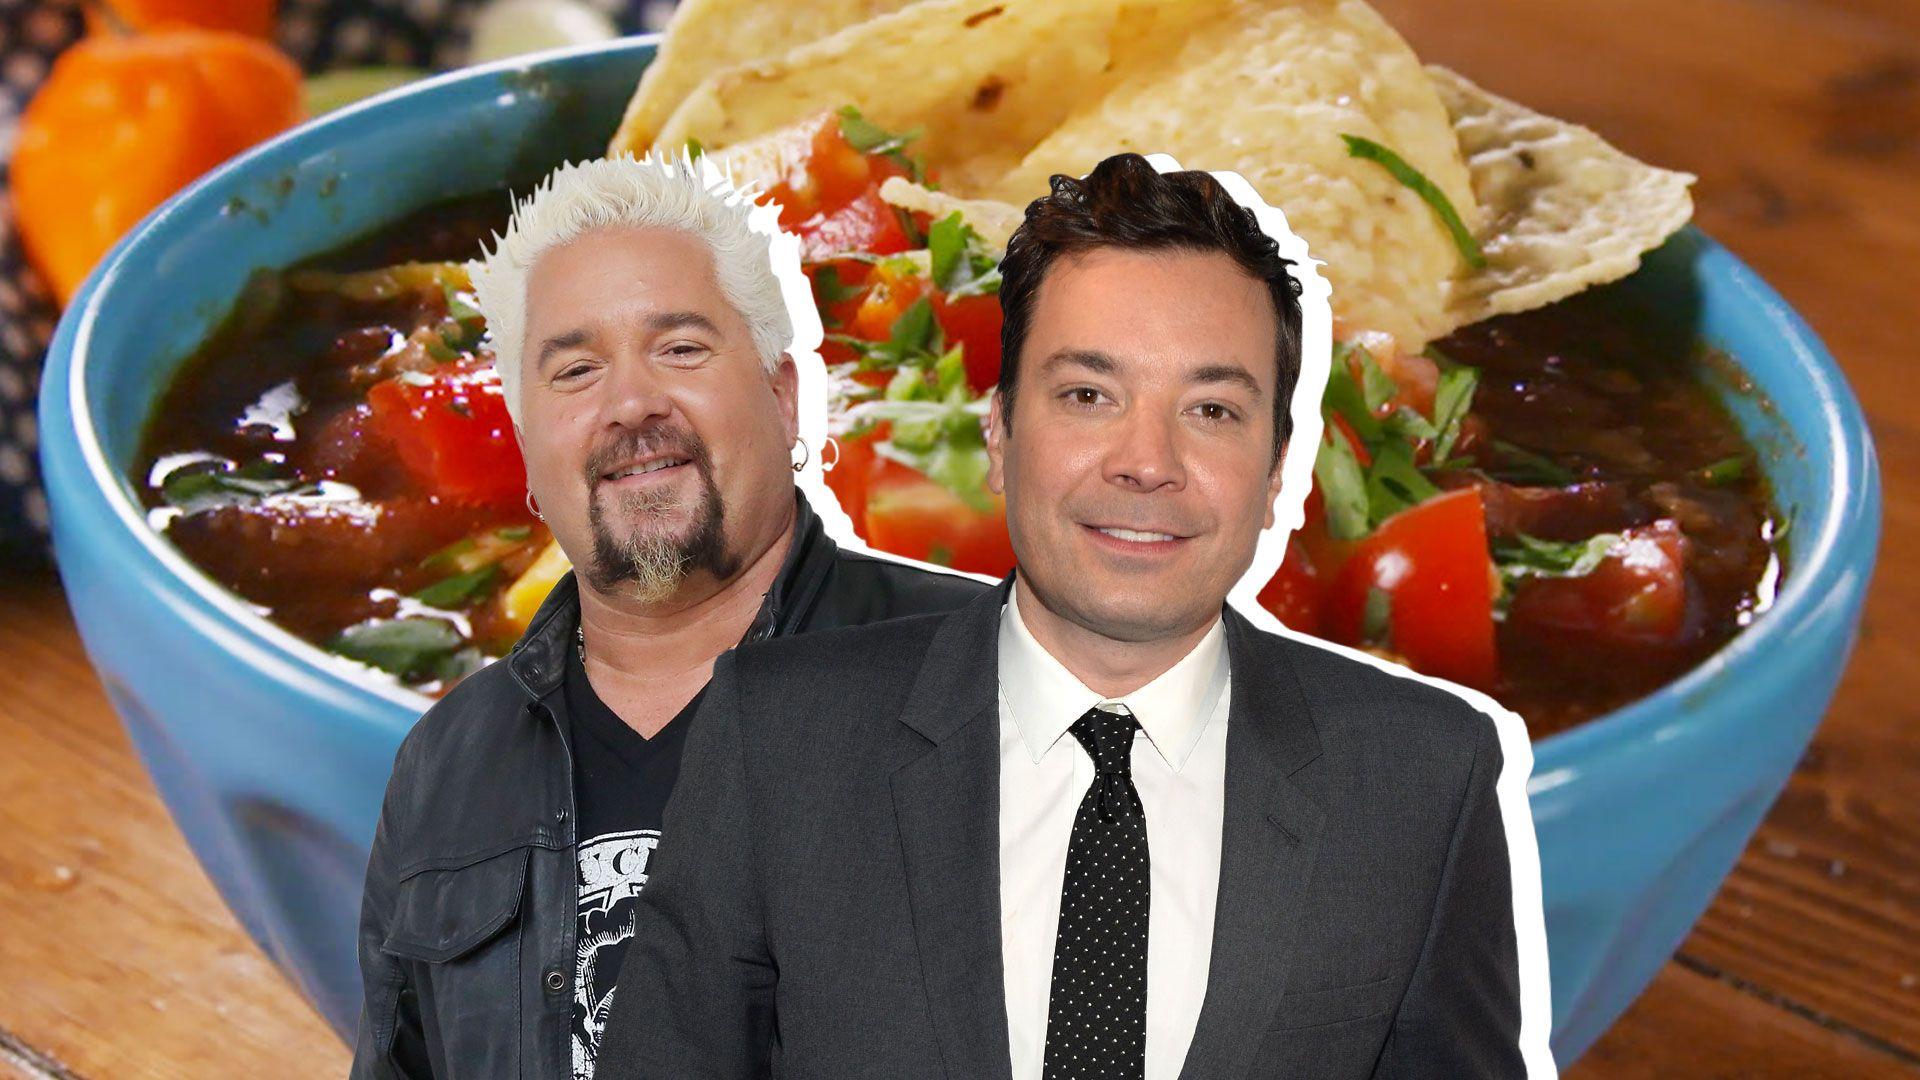 Jimmy Fallon Vs Guy Fieri Whose Chili Is Better